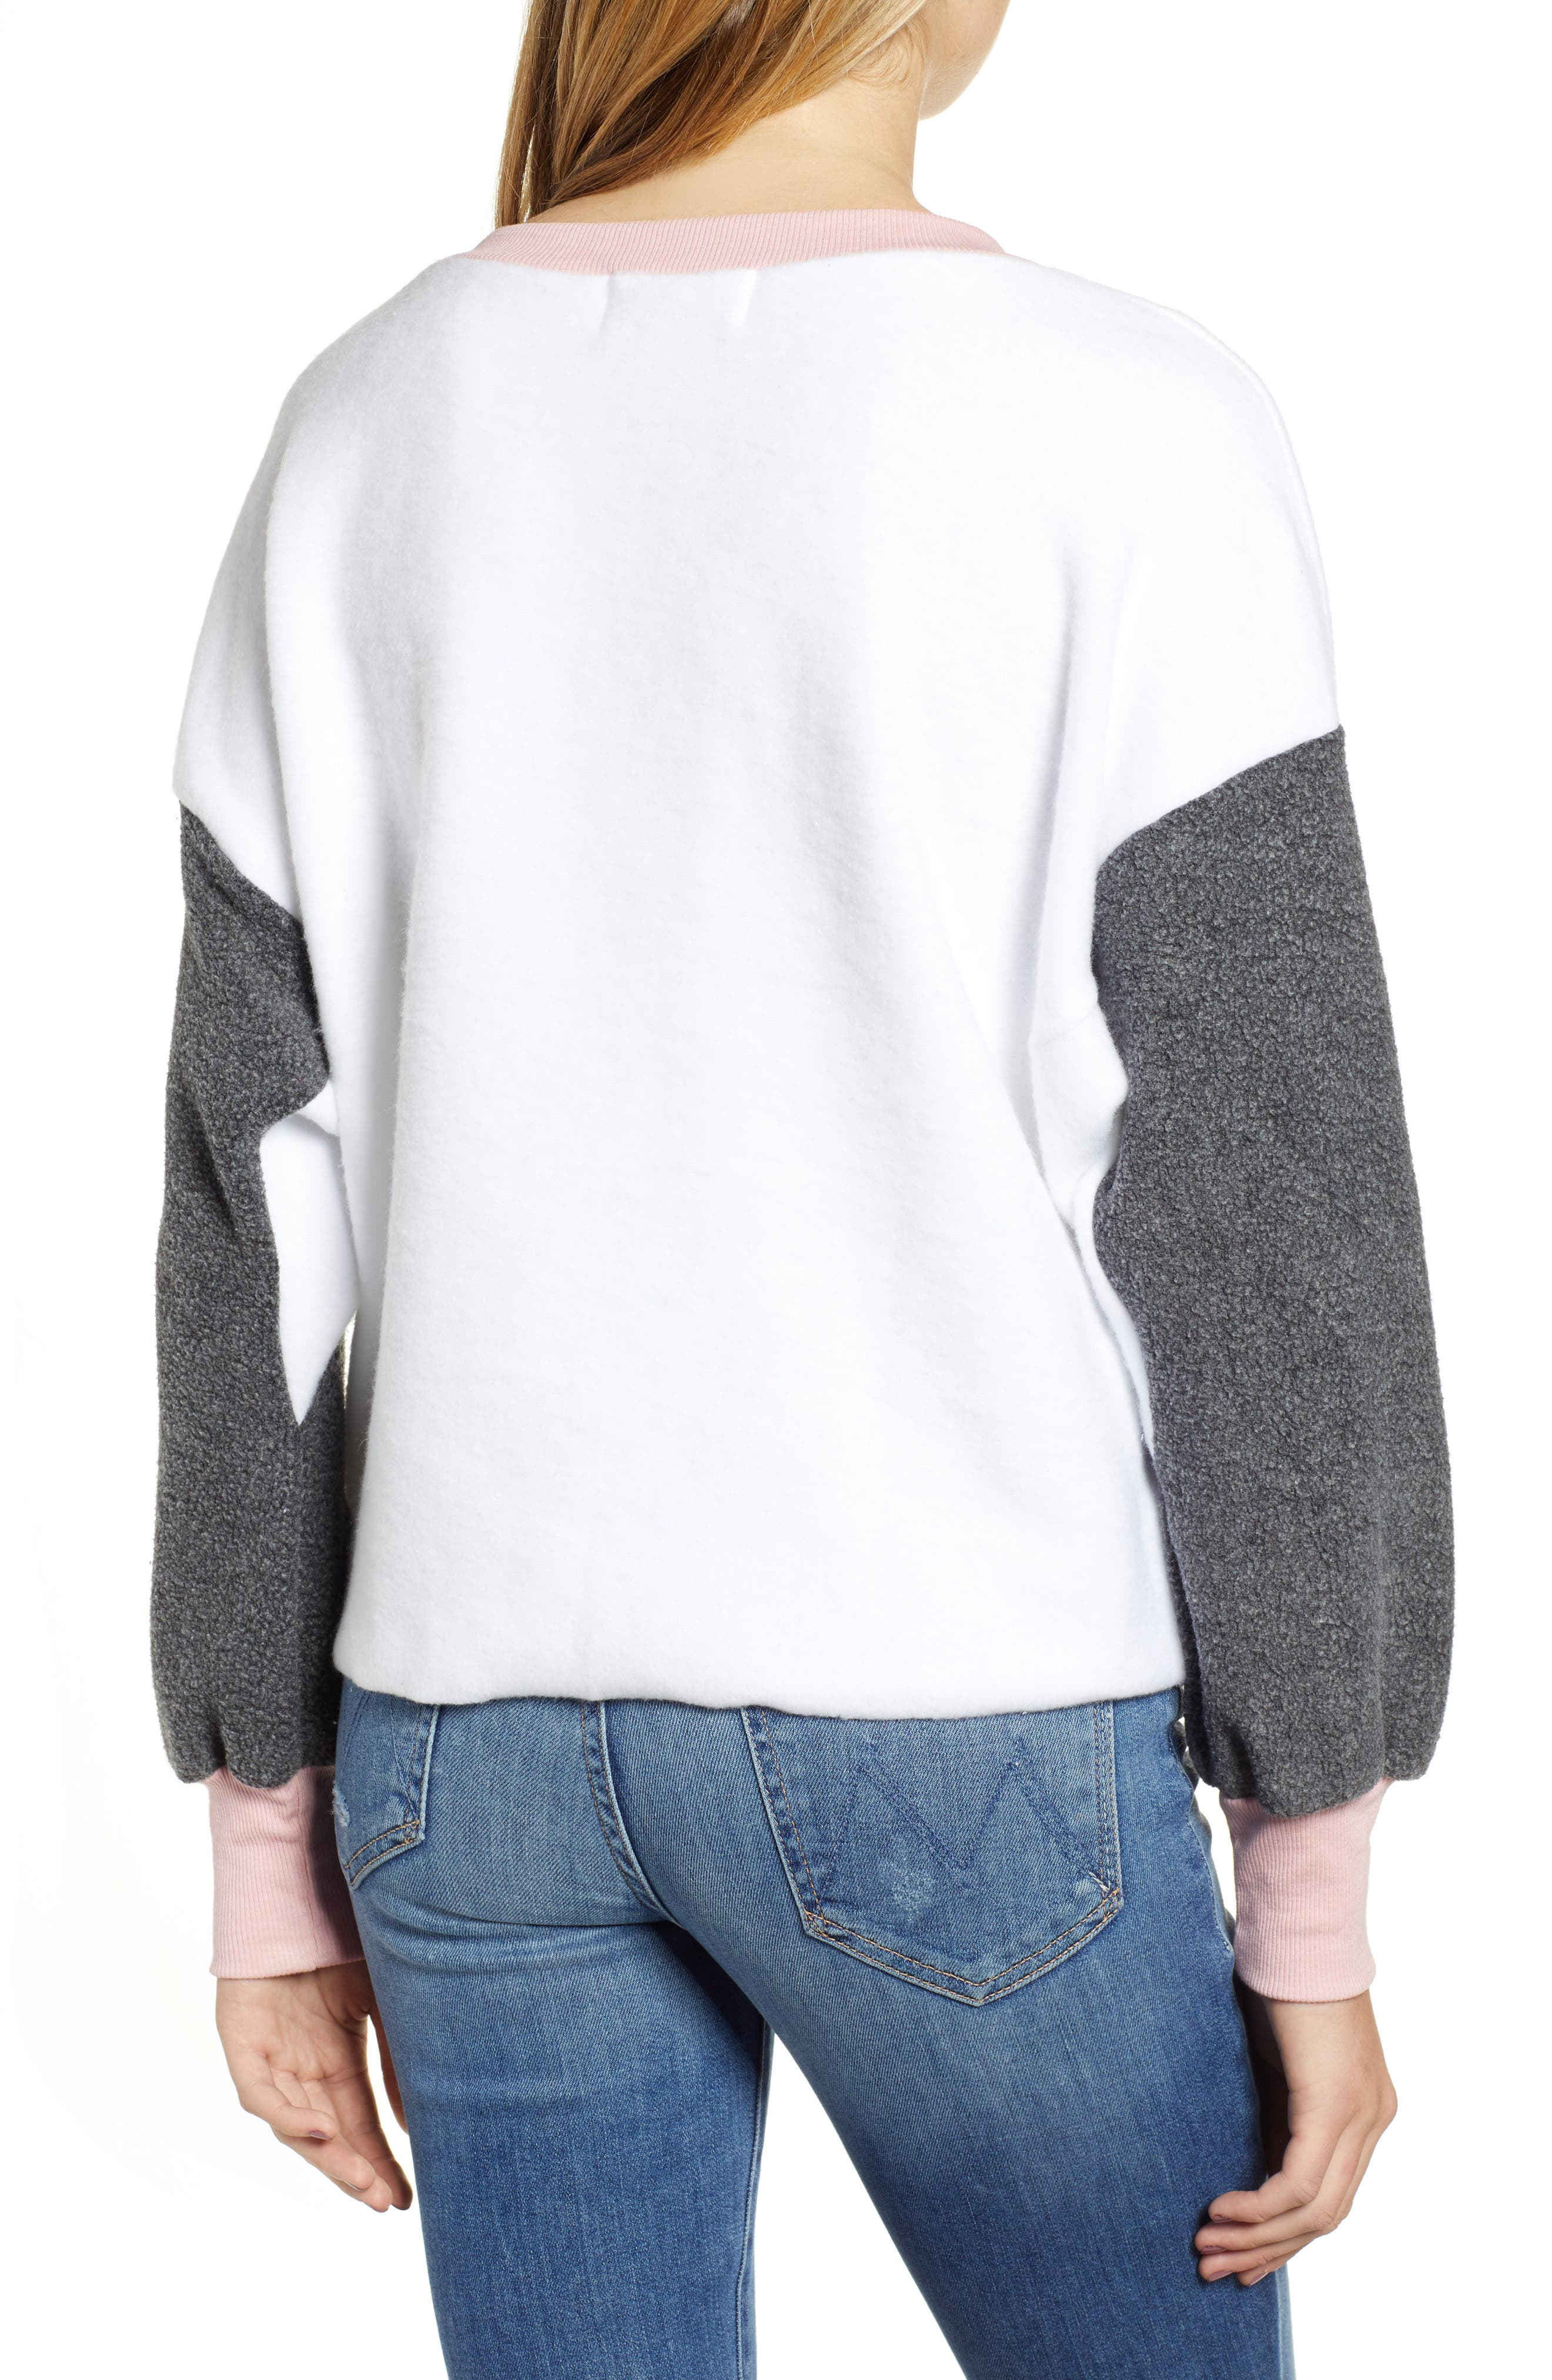 True Love Sweatshirt,                             Alternate thumbnail 2, color,                             CLEAN WHITE MULTI